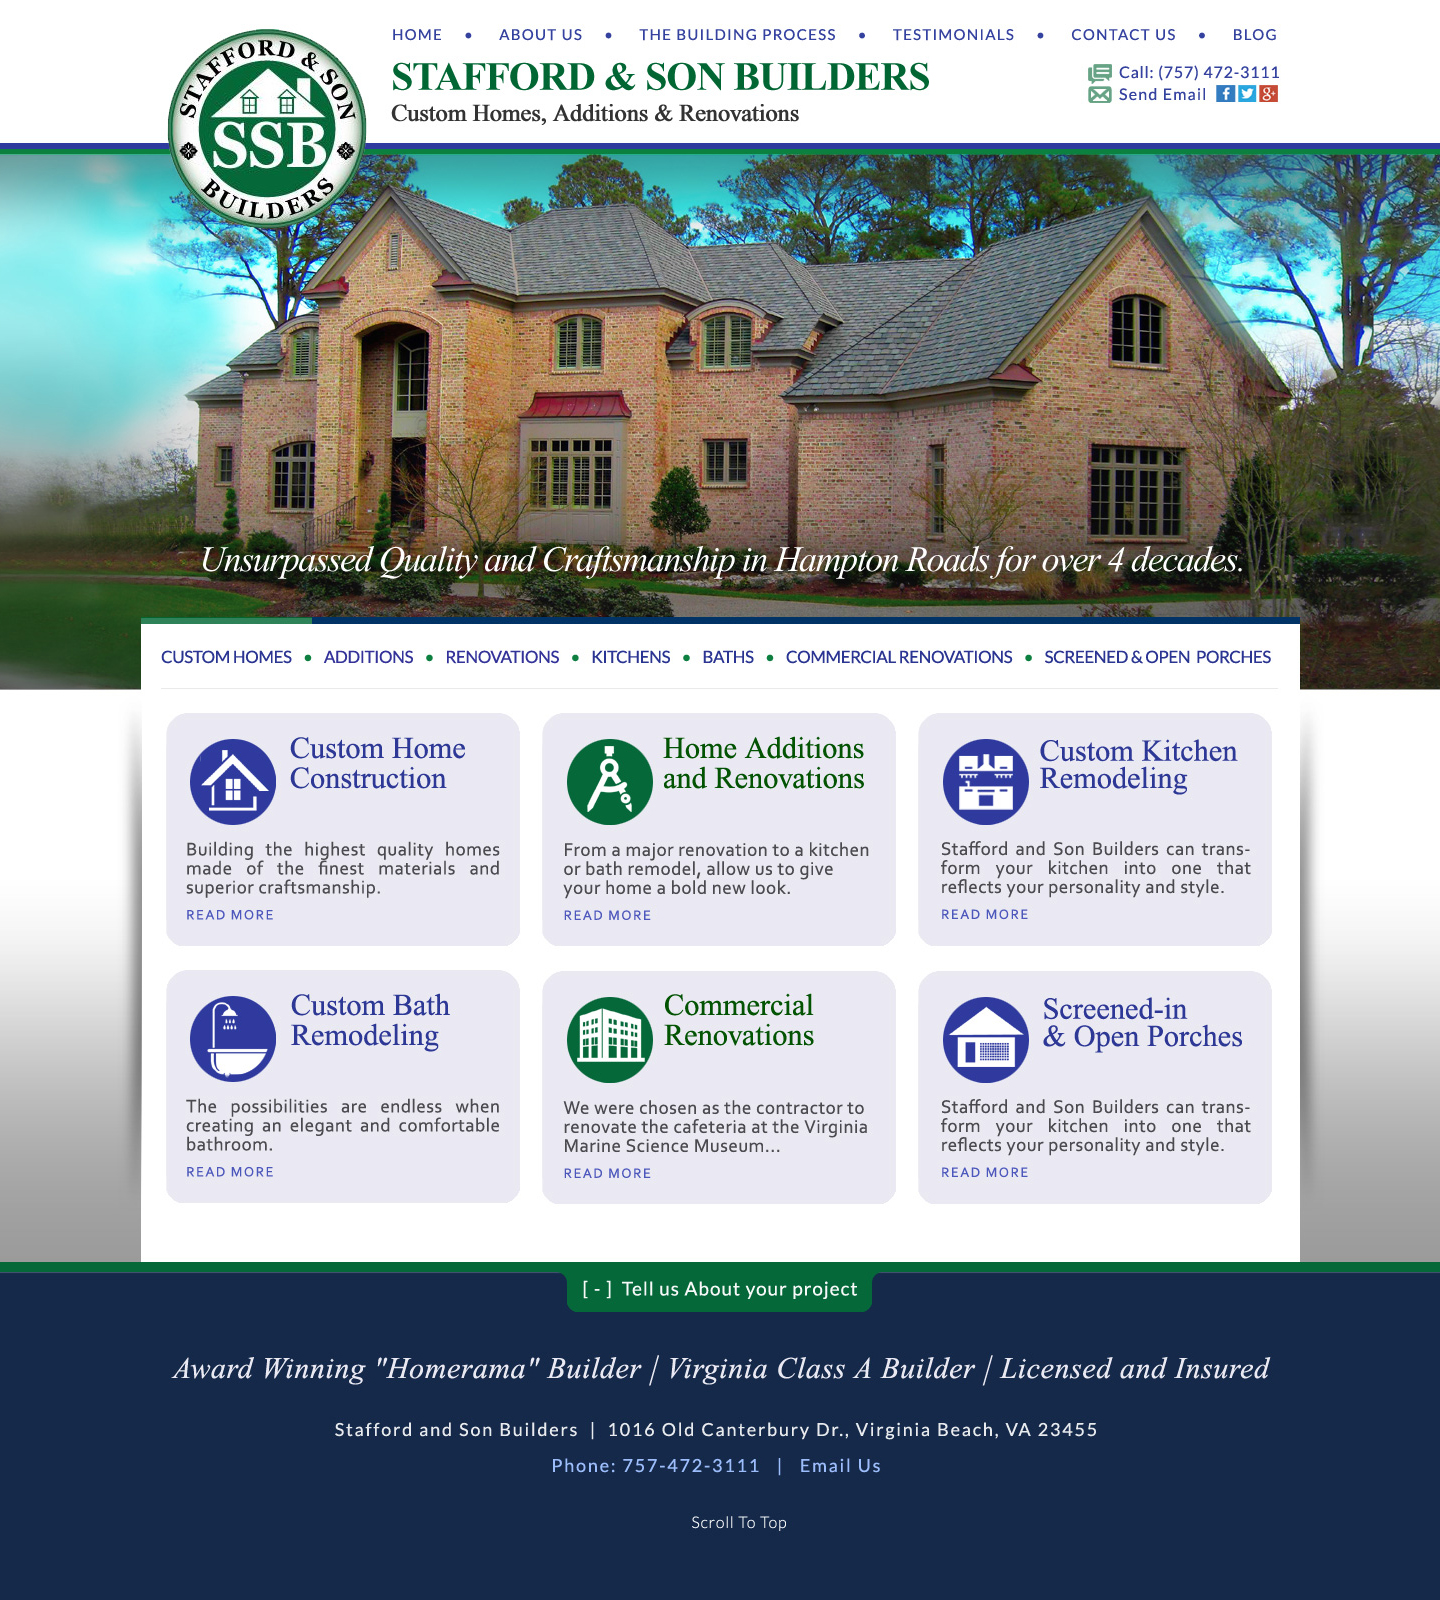 Web Design for Home Remodeling Contractors Virginia Beach VA : VISIONEFX